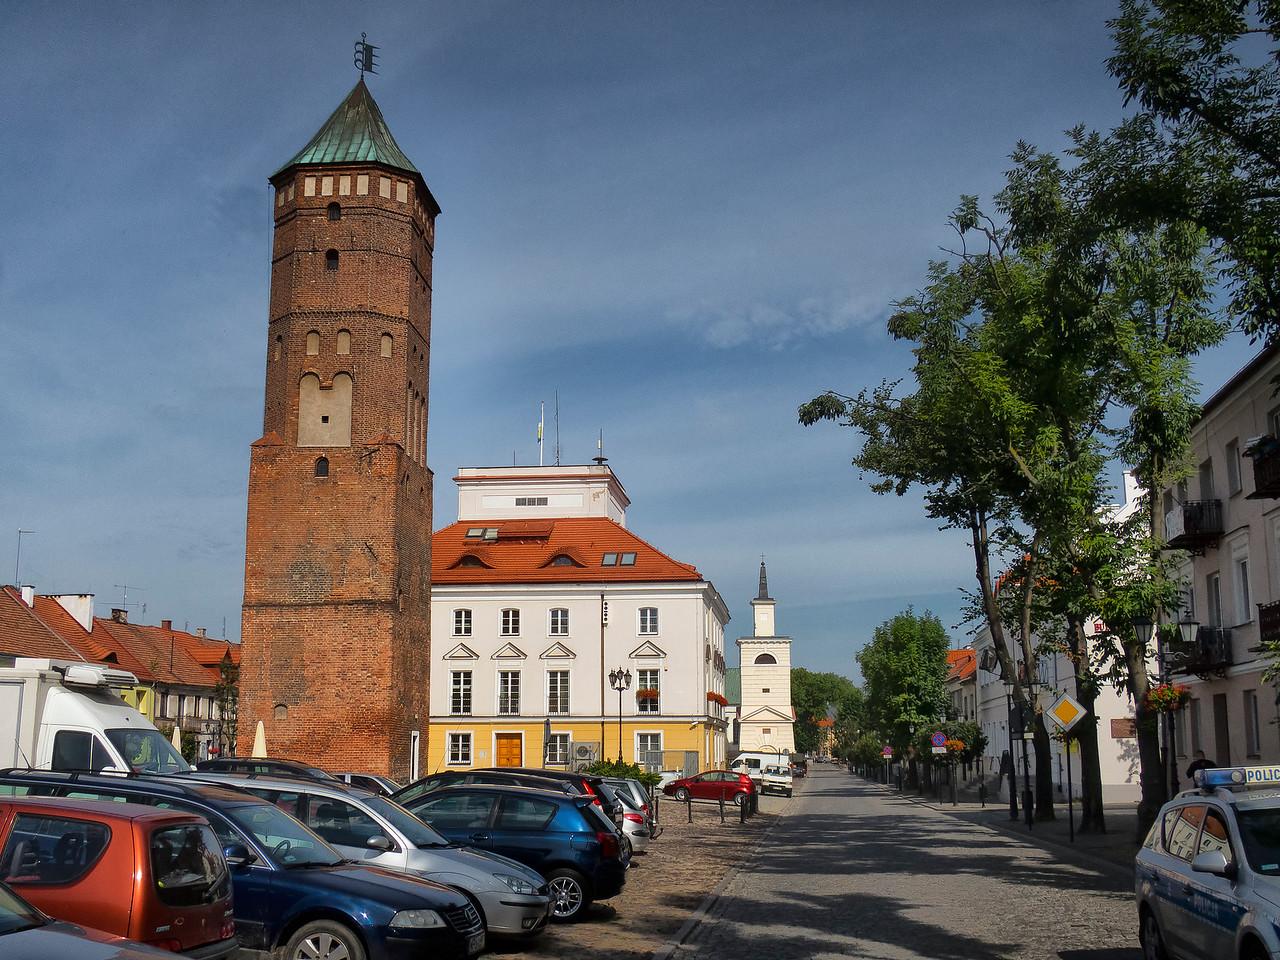 City Hall in Pułtusk, Polska / Ratusz w Pułtusku, Polska